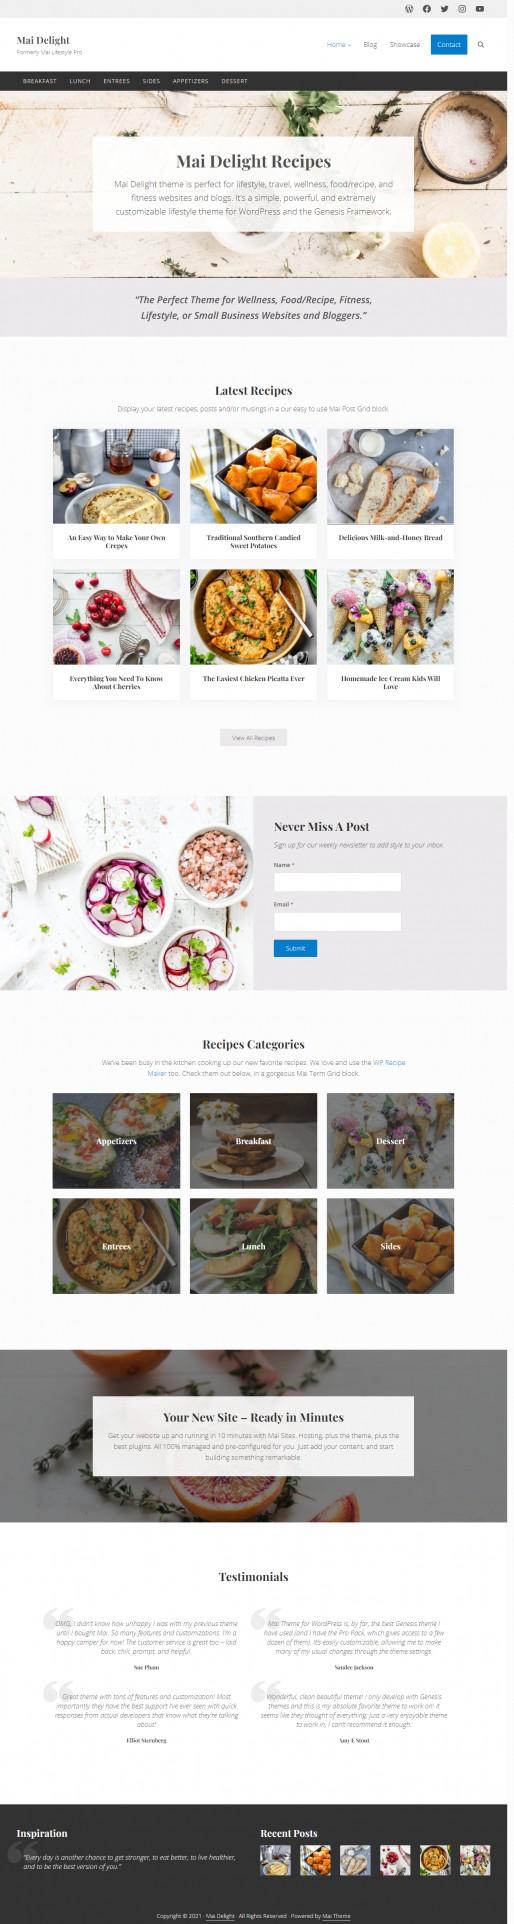 Mai Delight Demo StudioPress – Formerly Mai Lifestyle Pro